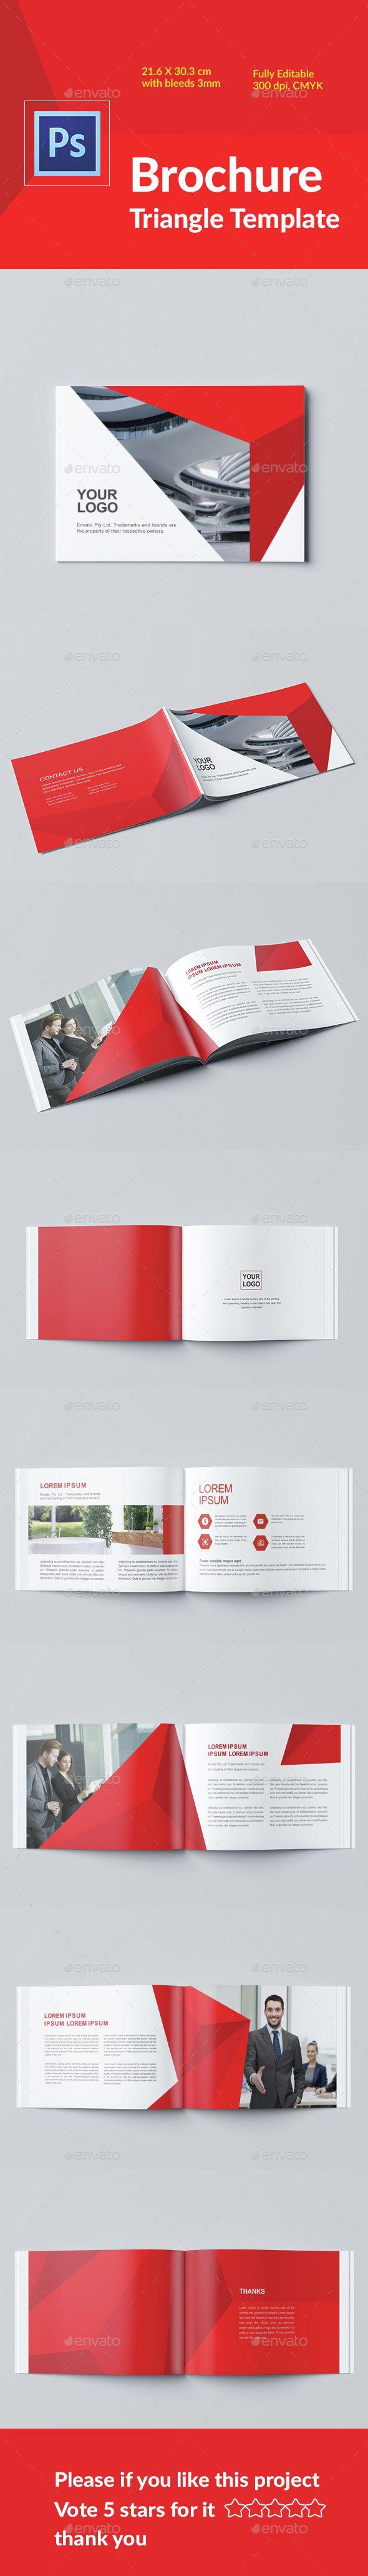 Brochure Template Polygan   Arquitectura